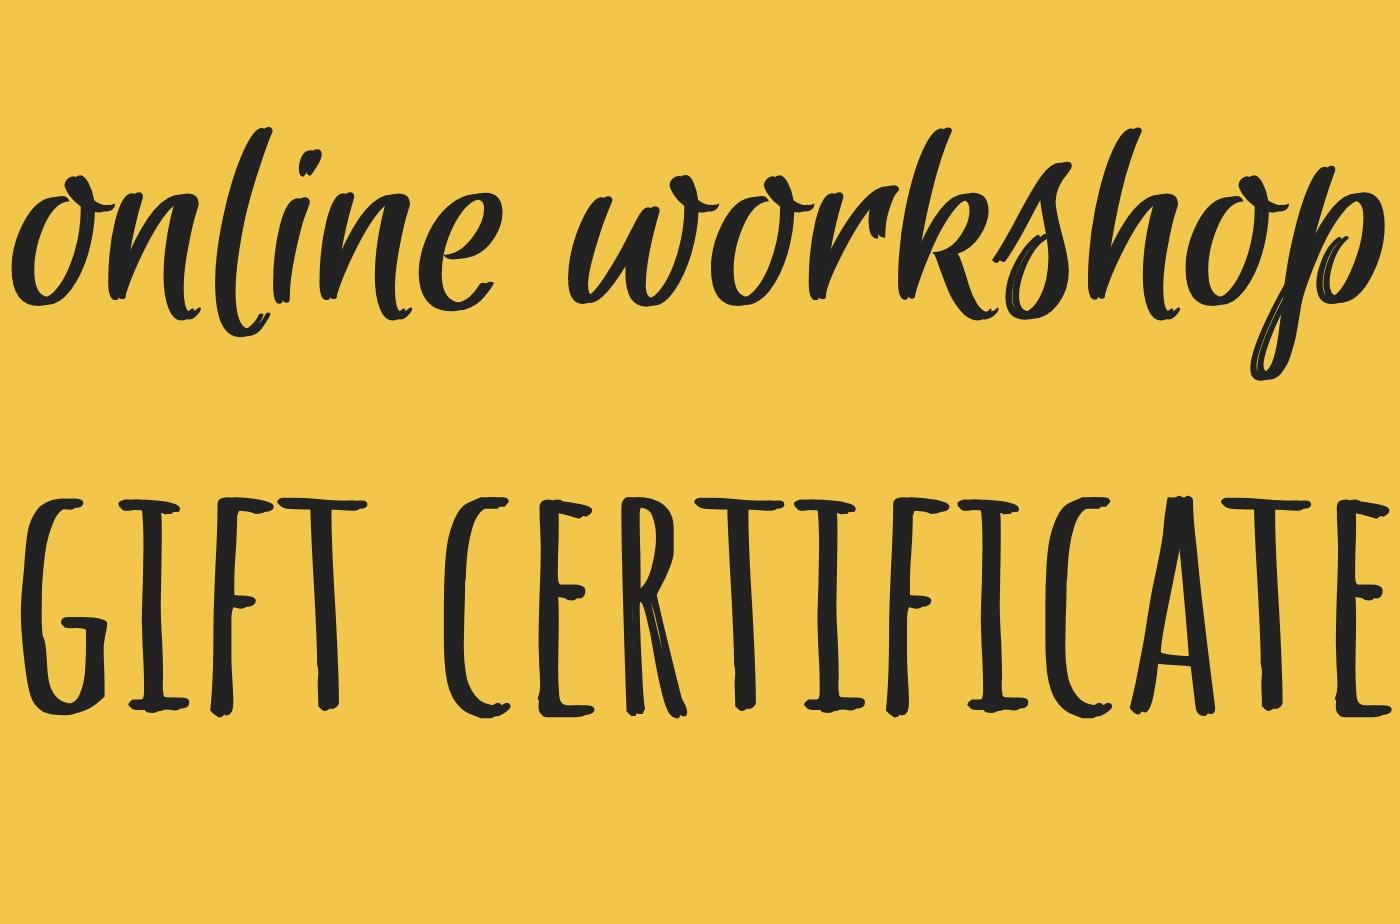 Catapult online classes: Catapult Classes, Online Workshop Gift Certificate, Open-Genre, Workshop